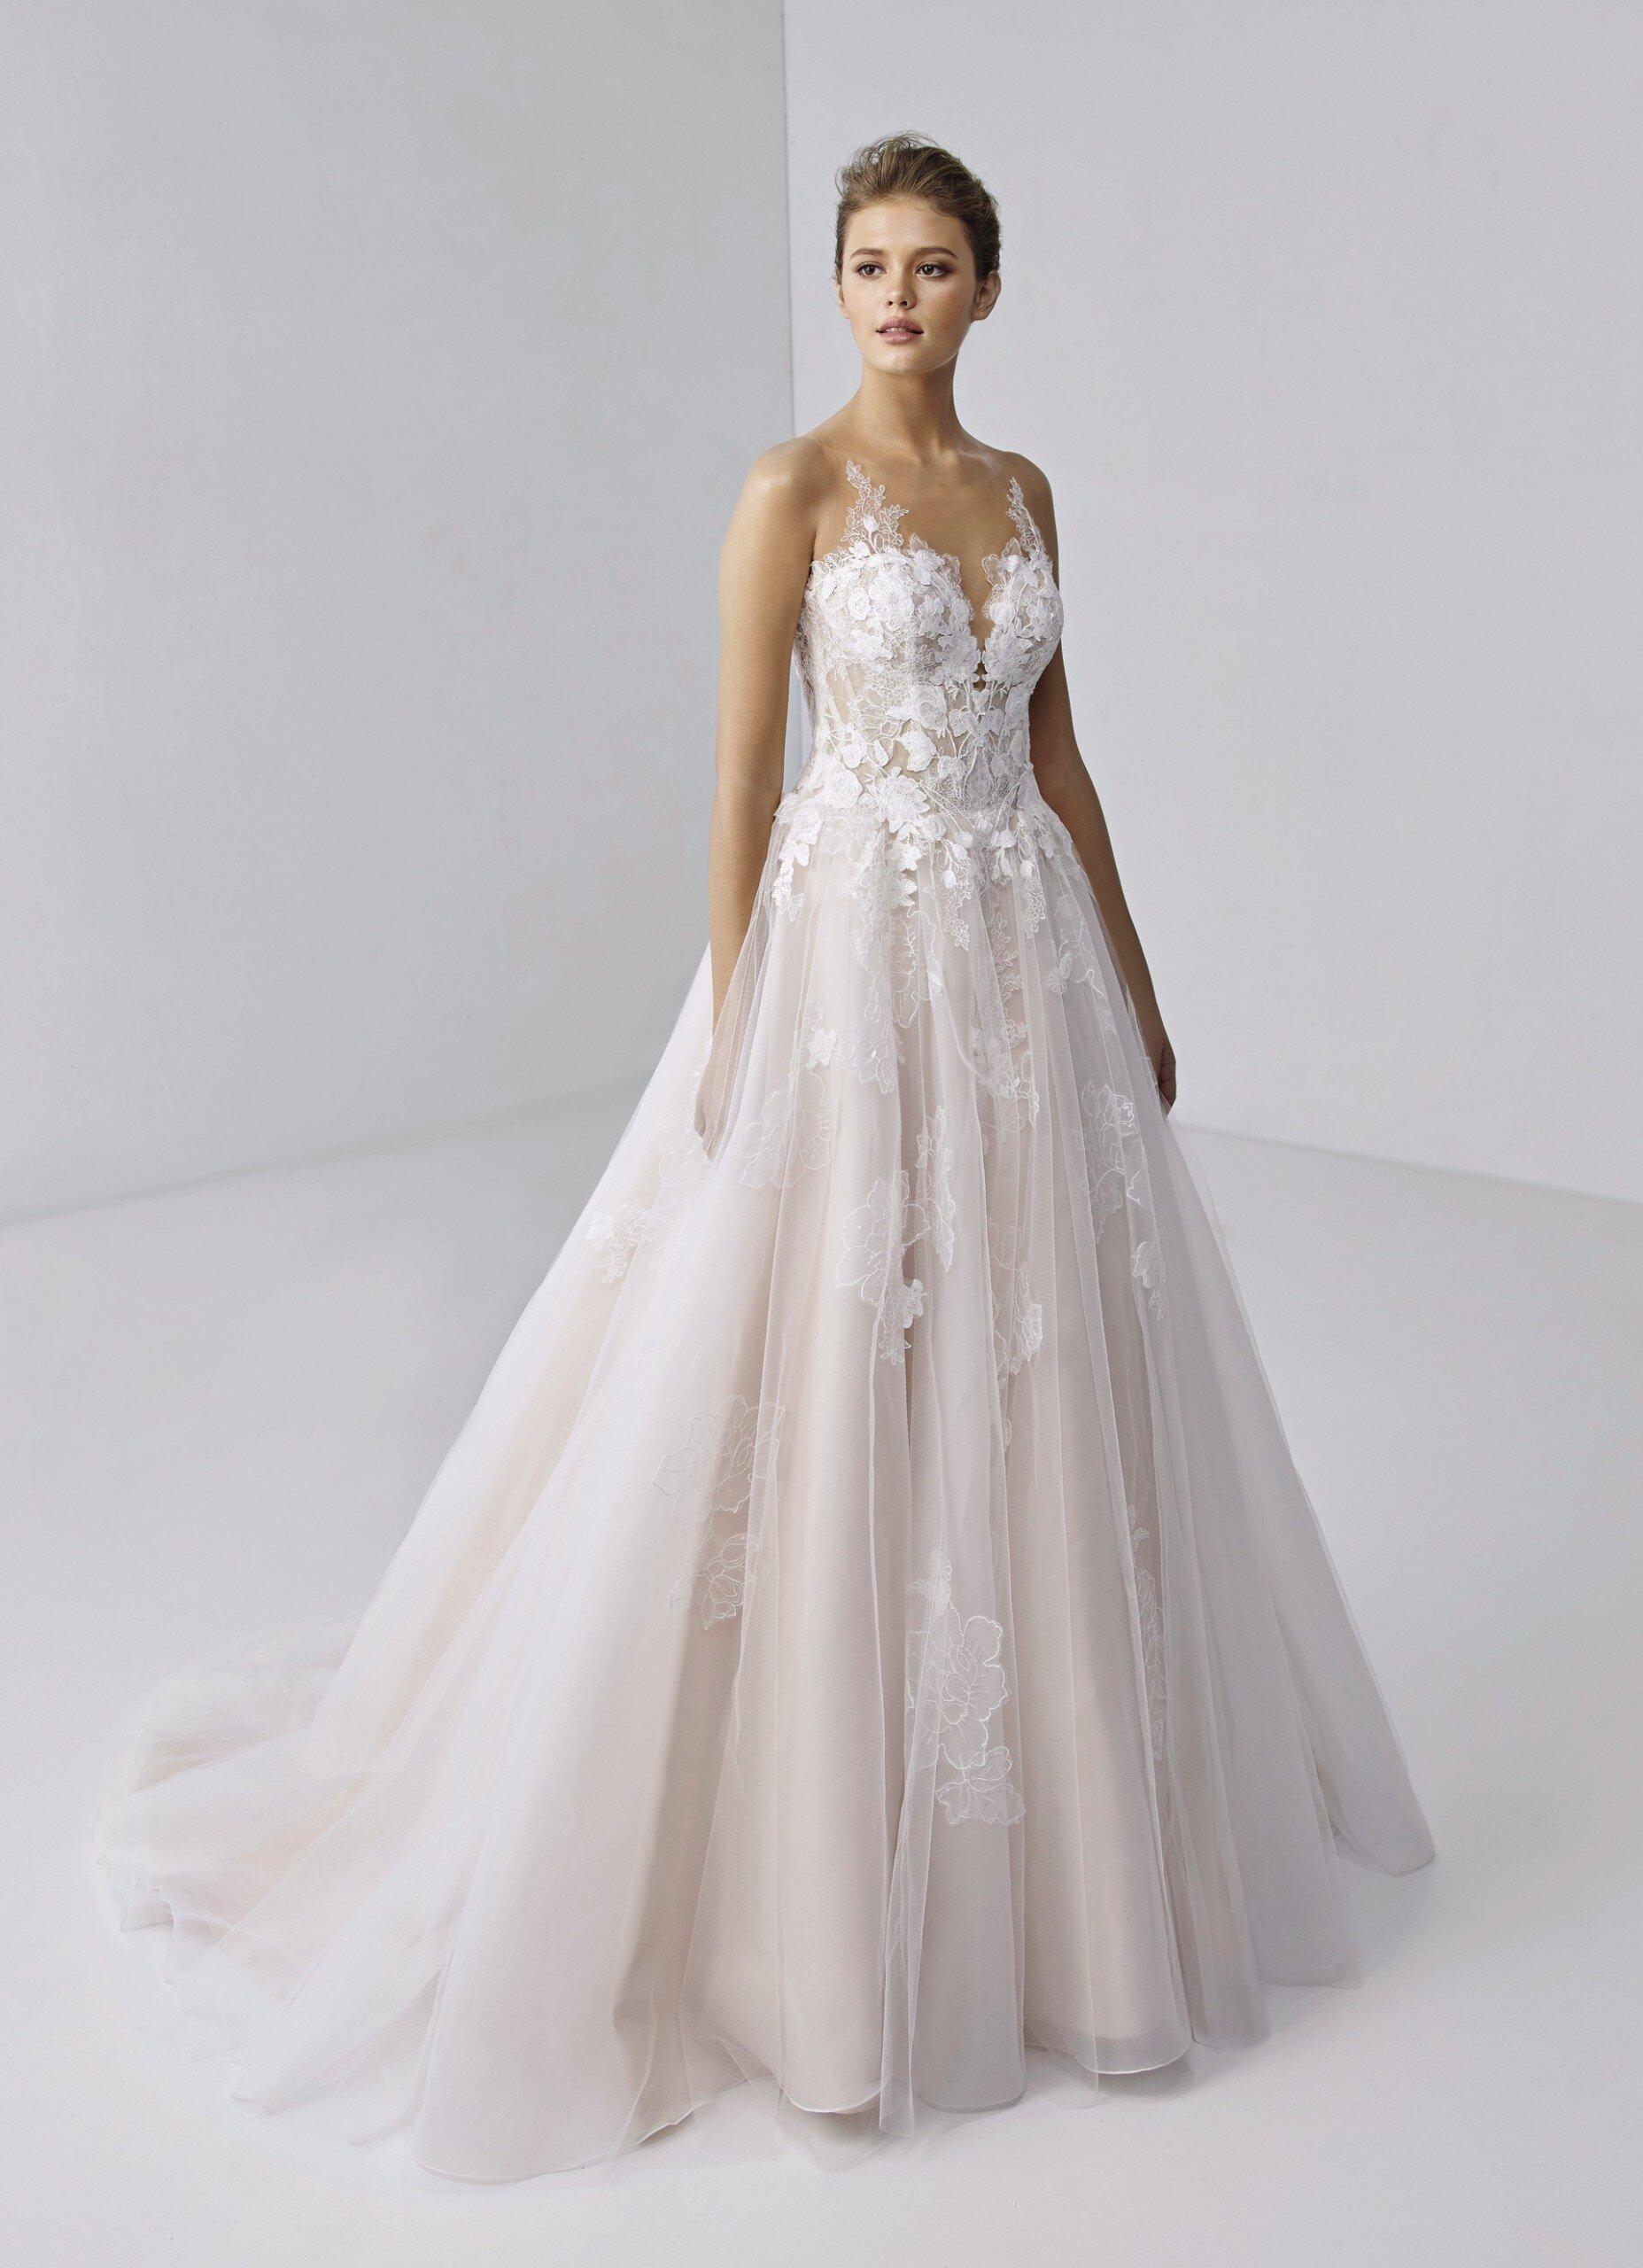 Etoile Brautmode Kollektion 2021 Modell Fleur